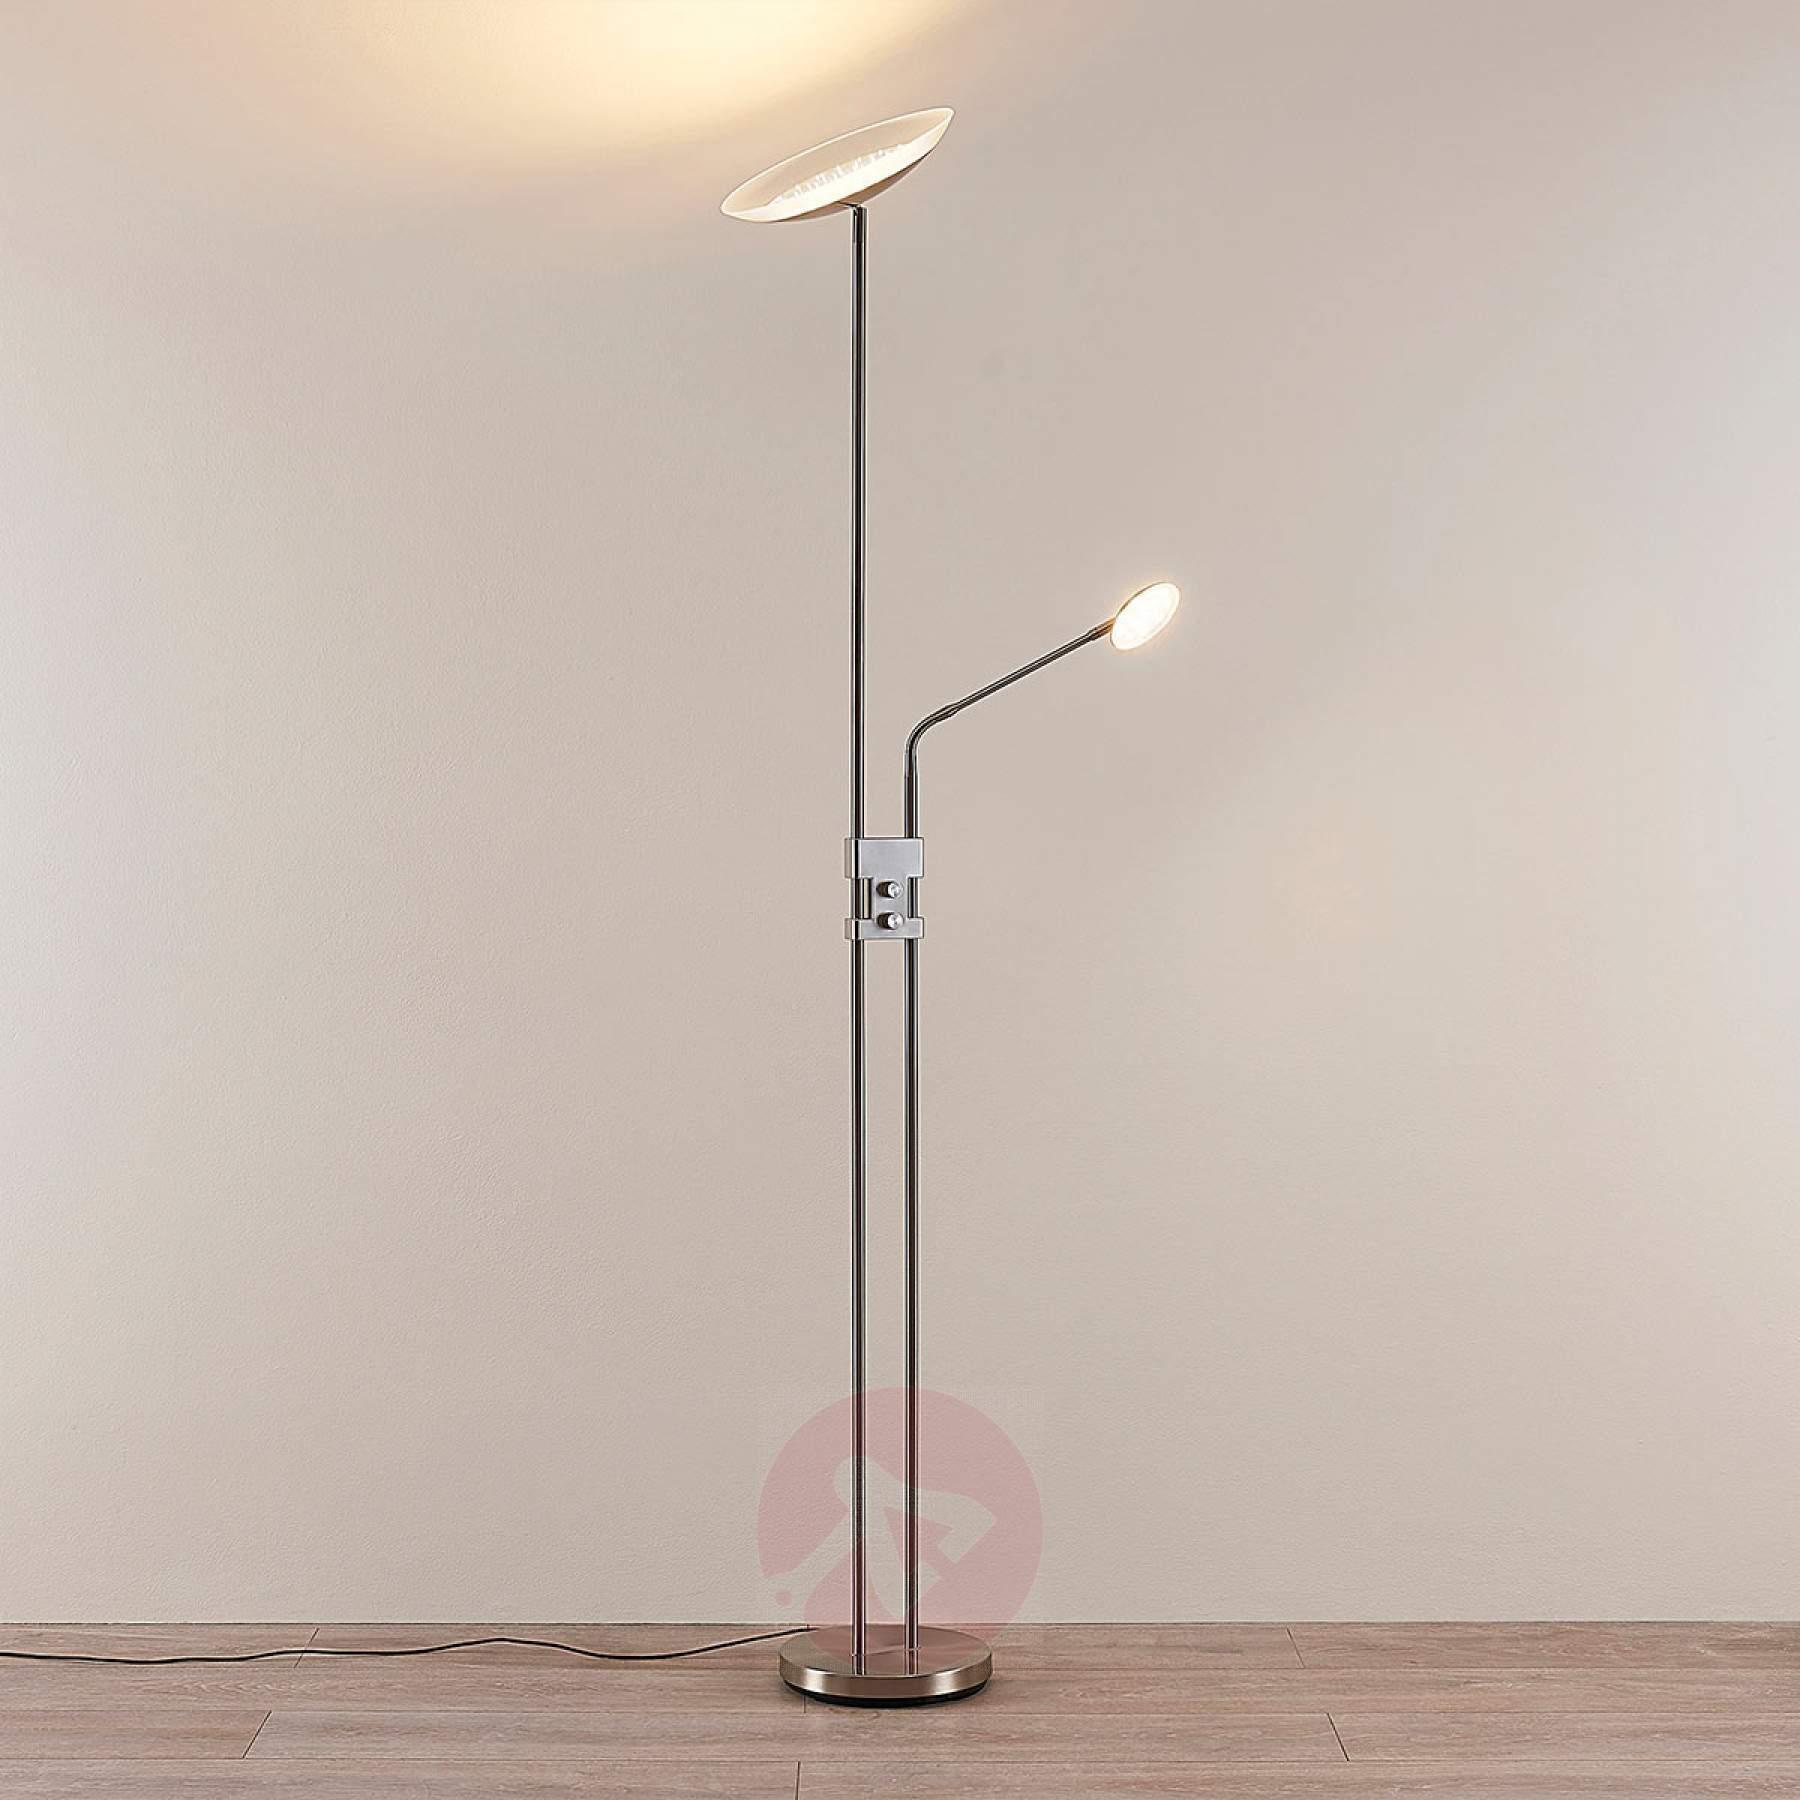 Full Size of Stehlampe Dimmbar Led Deckenfluter Jonne Mit Lesearm Stehlampen Wohnzimmer Schlafzimmer Wohnzimmer Stehlampe Dimmbar